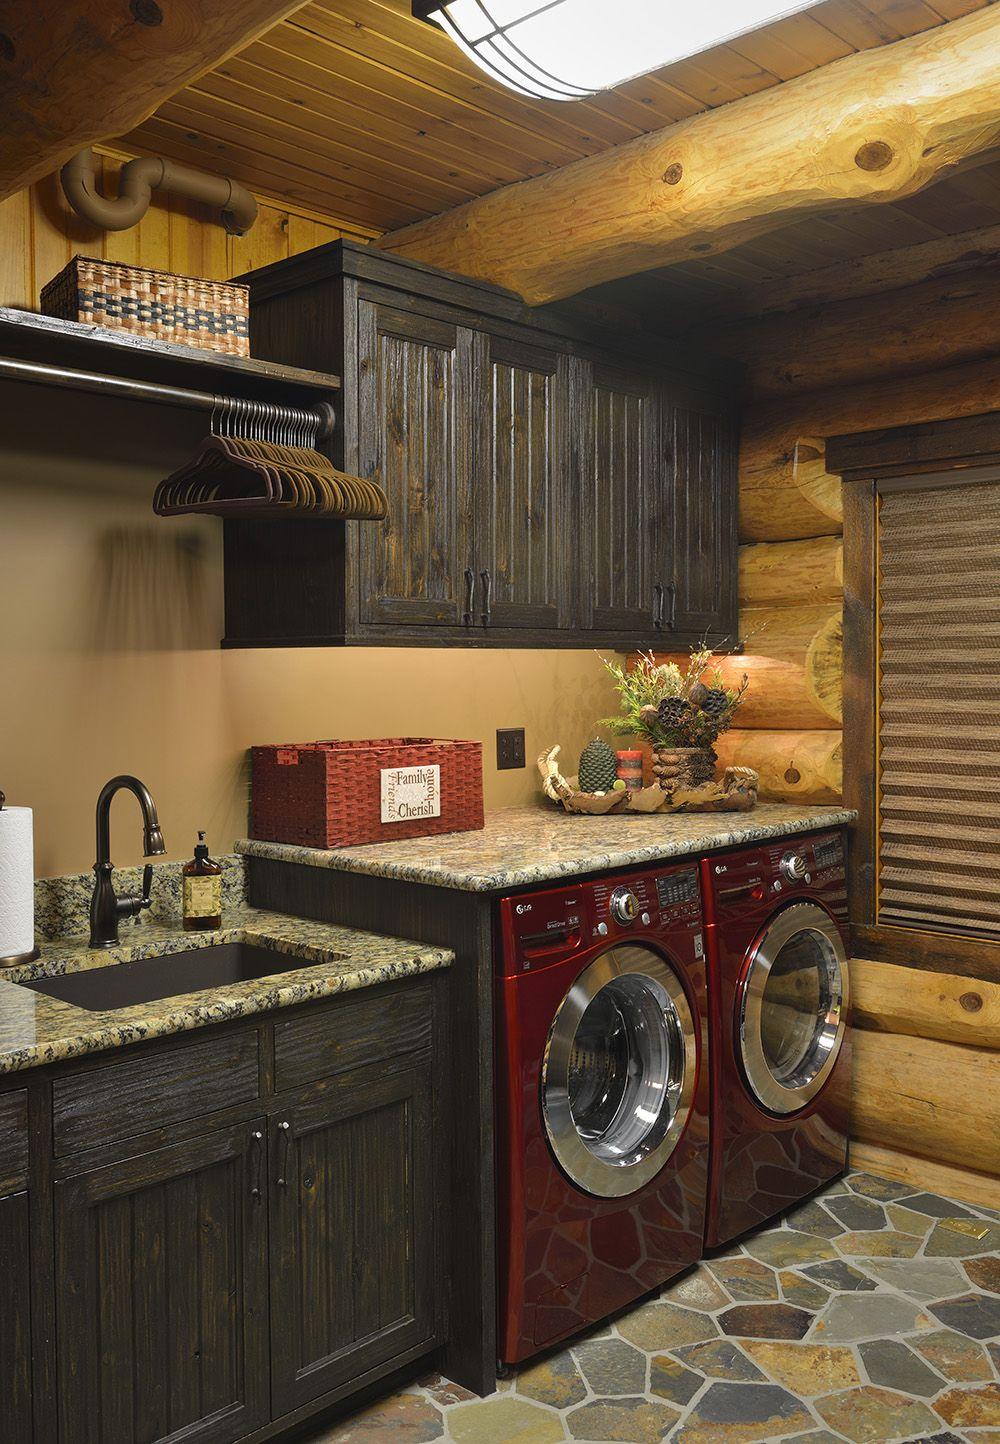 Laundry Room Using Ikea Cabinets